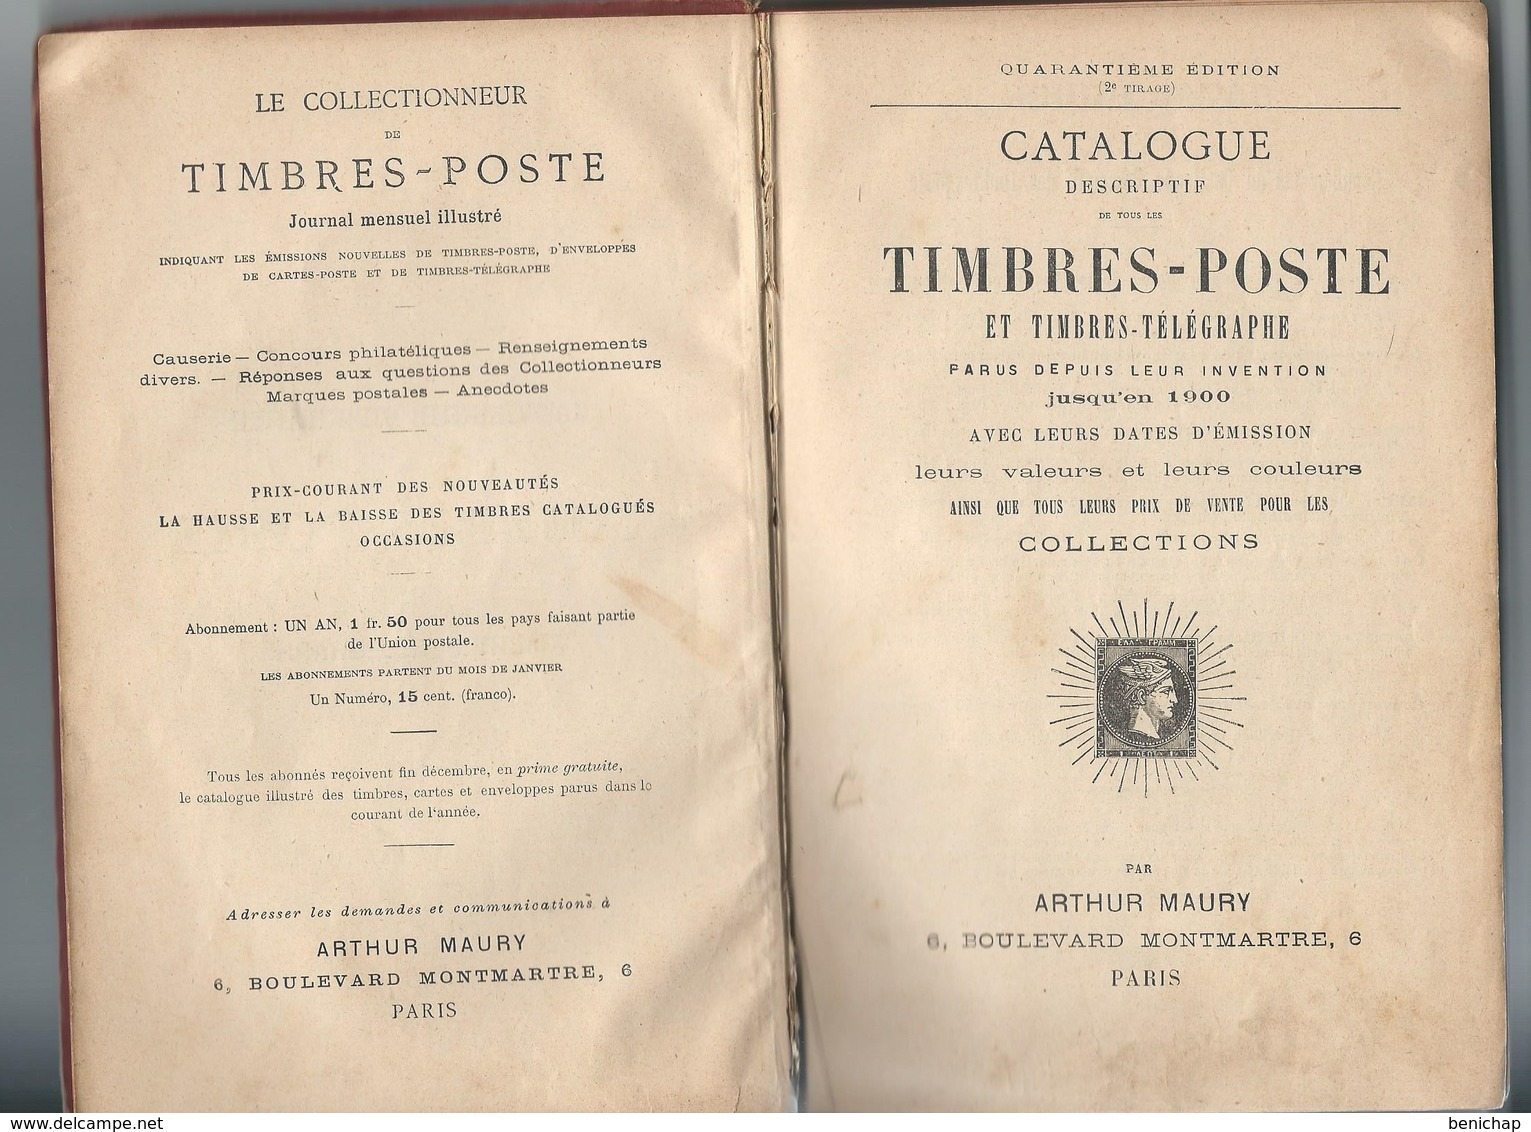 Catalogue Timbres-postes Arthur Maury - 40 ème Edition 1900. - France